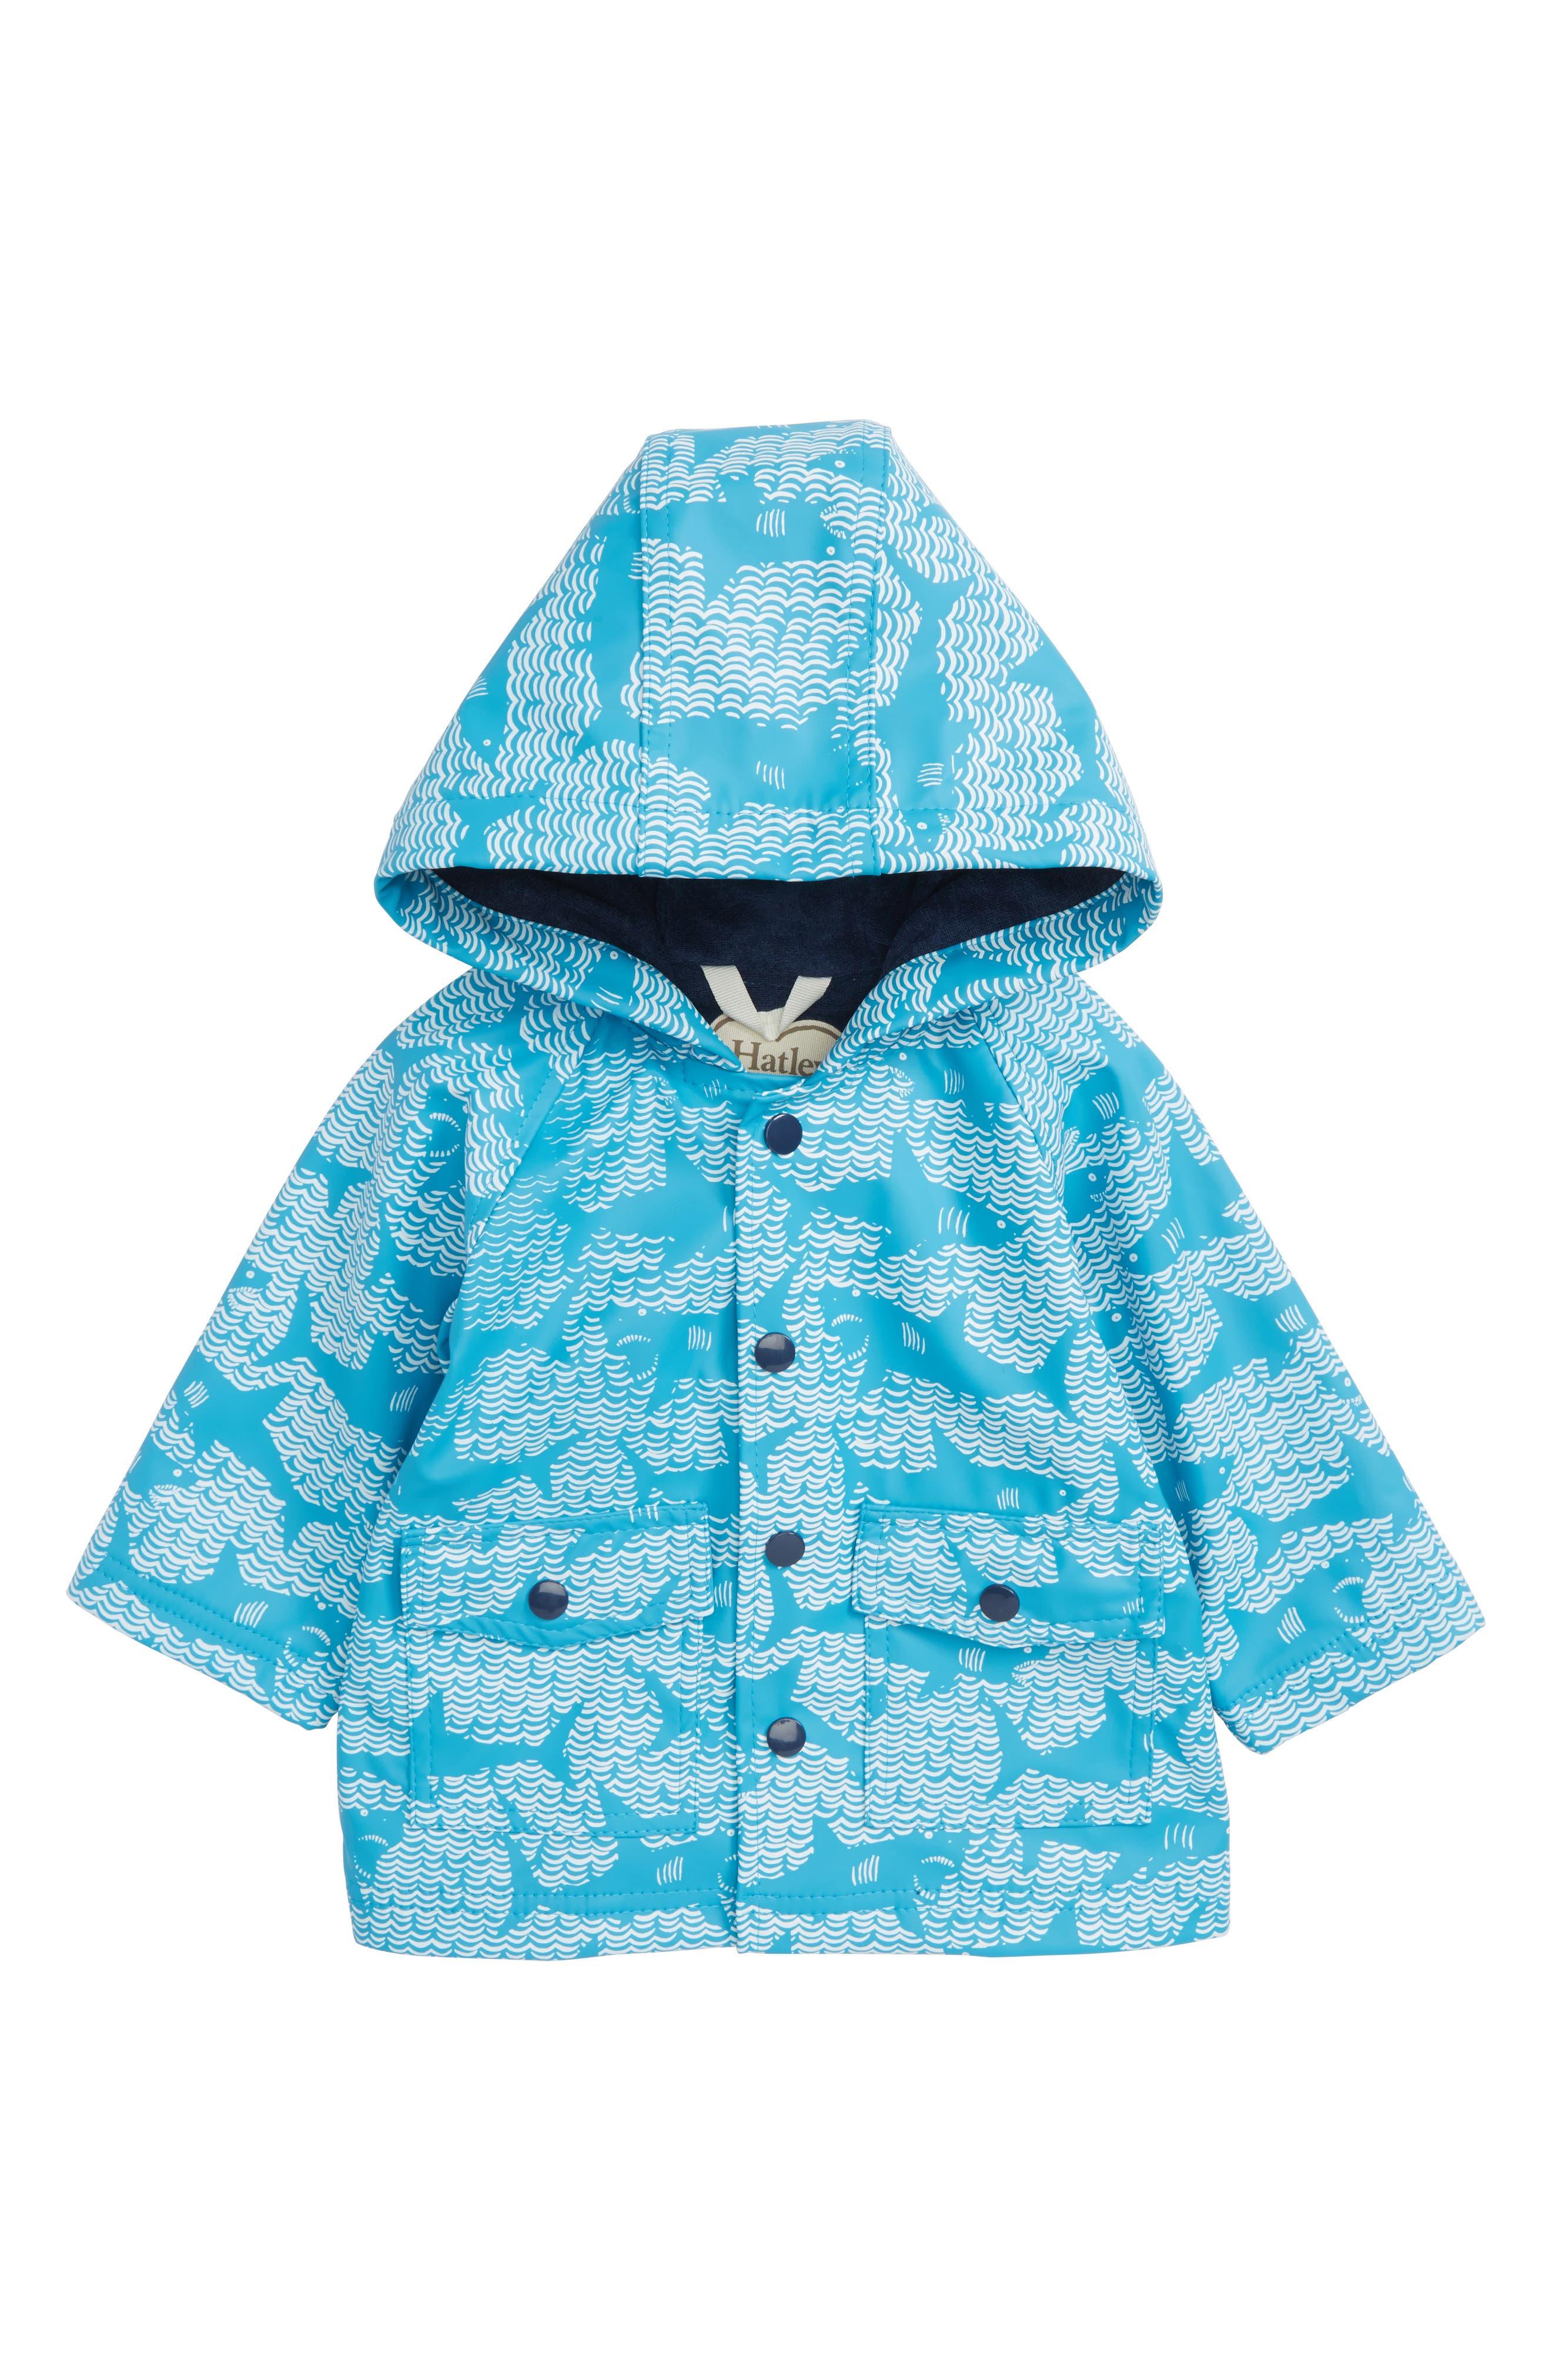 Shark Alley Hooded Raincoat,                             Main thumbnail 1, color,                             400